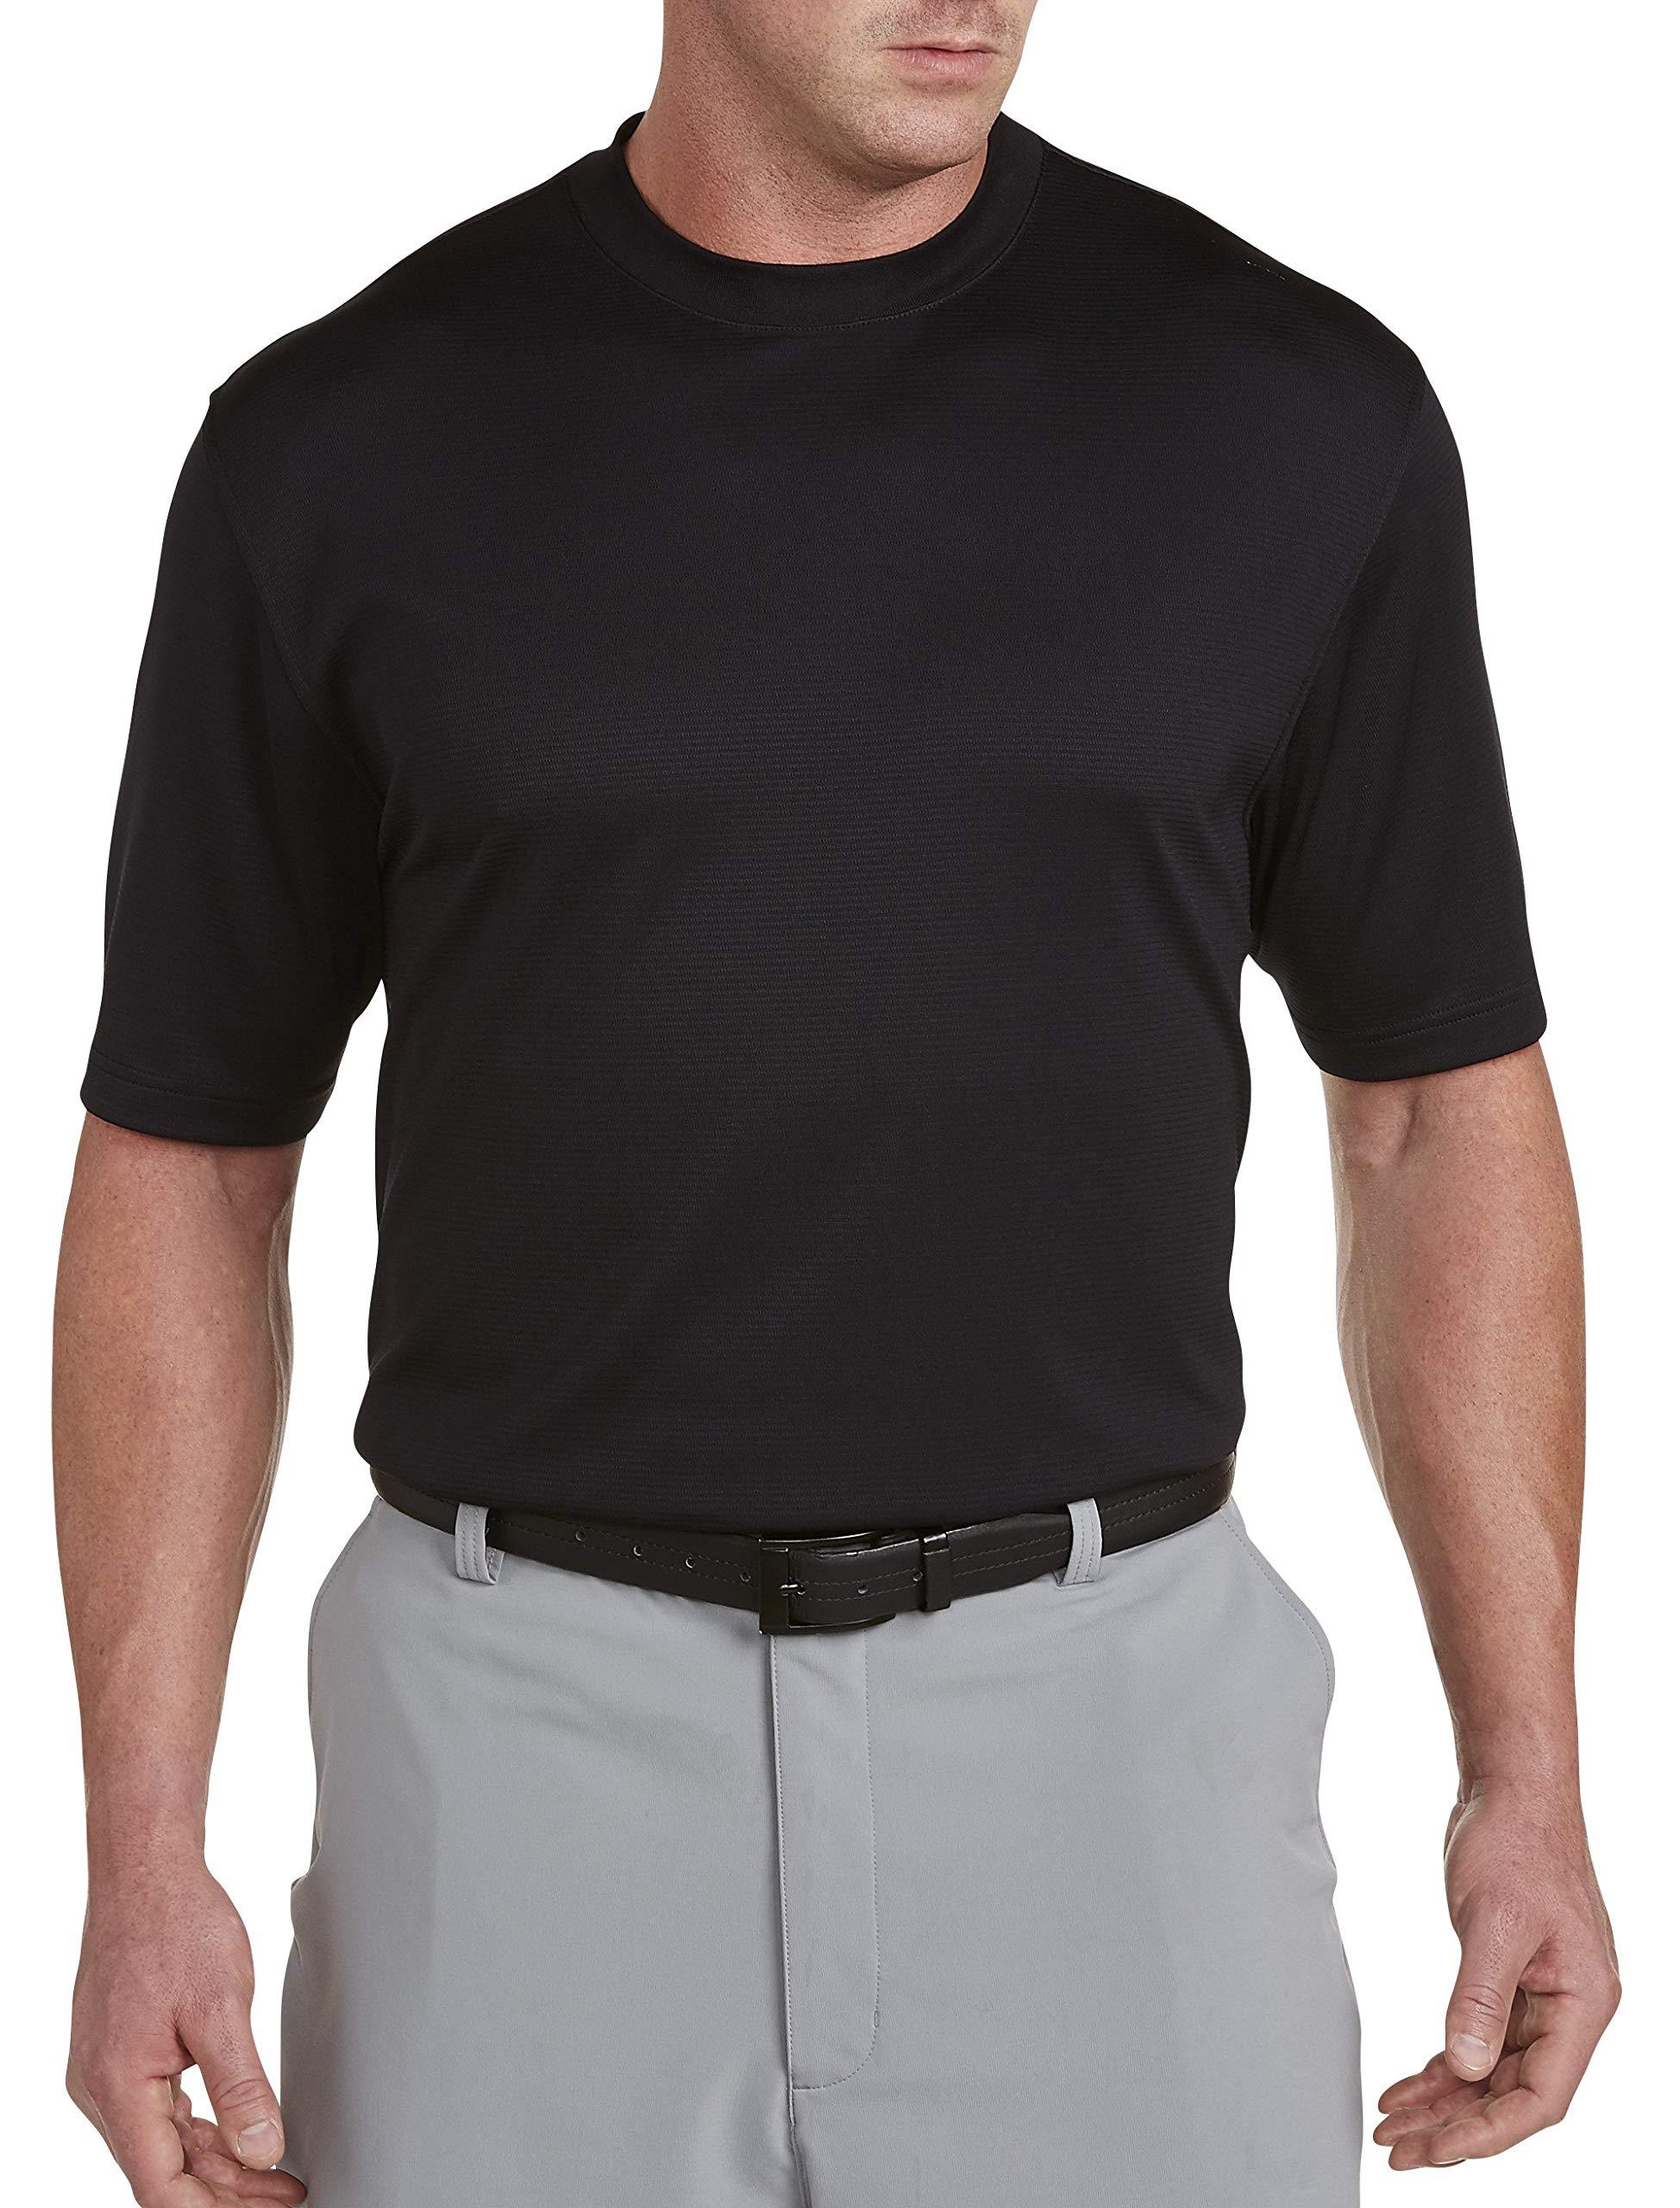 Reebok Big & Tall Golf Play Dry Solid Mockneck T-Shirt Black